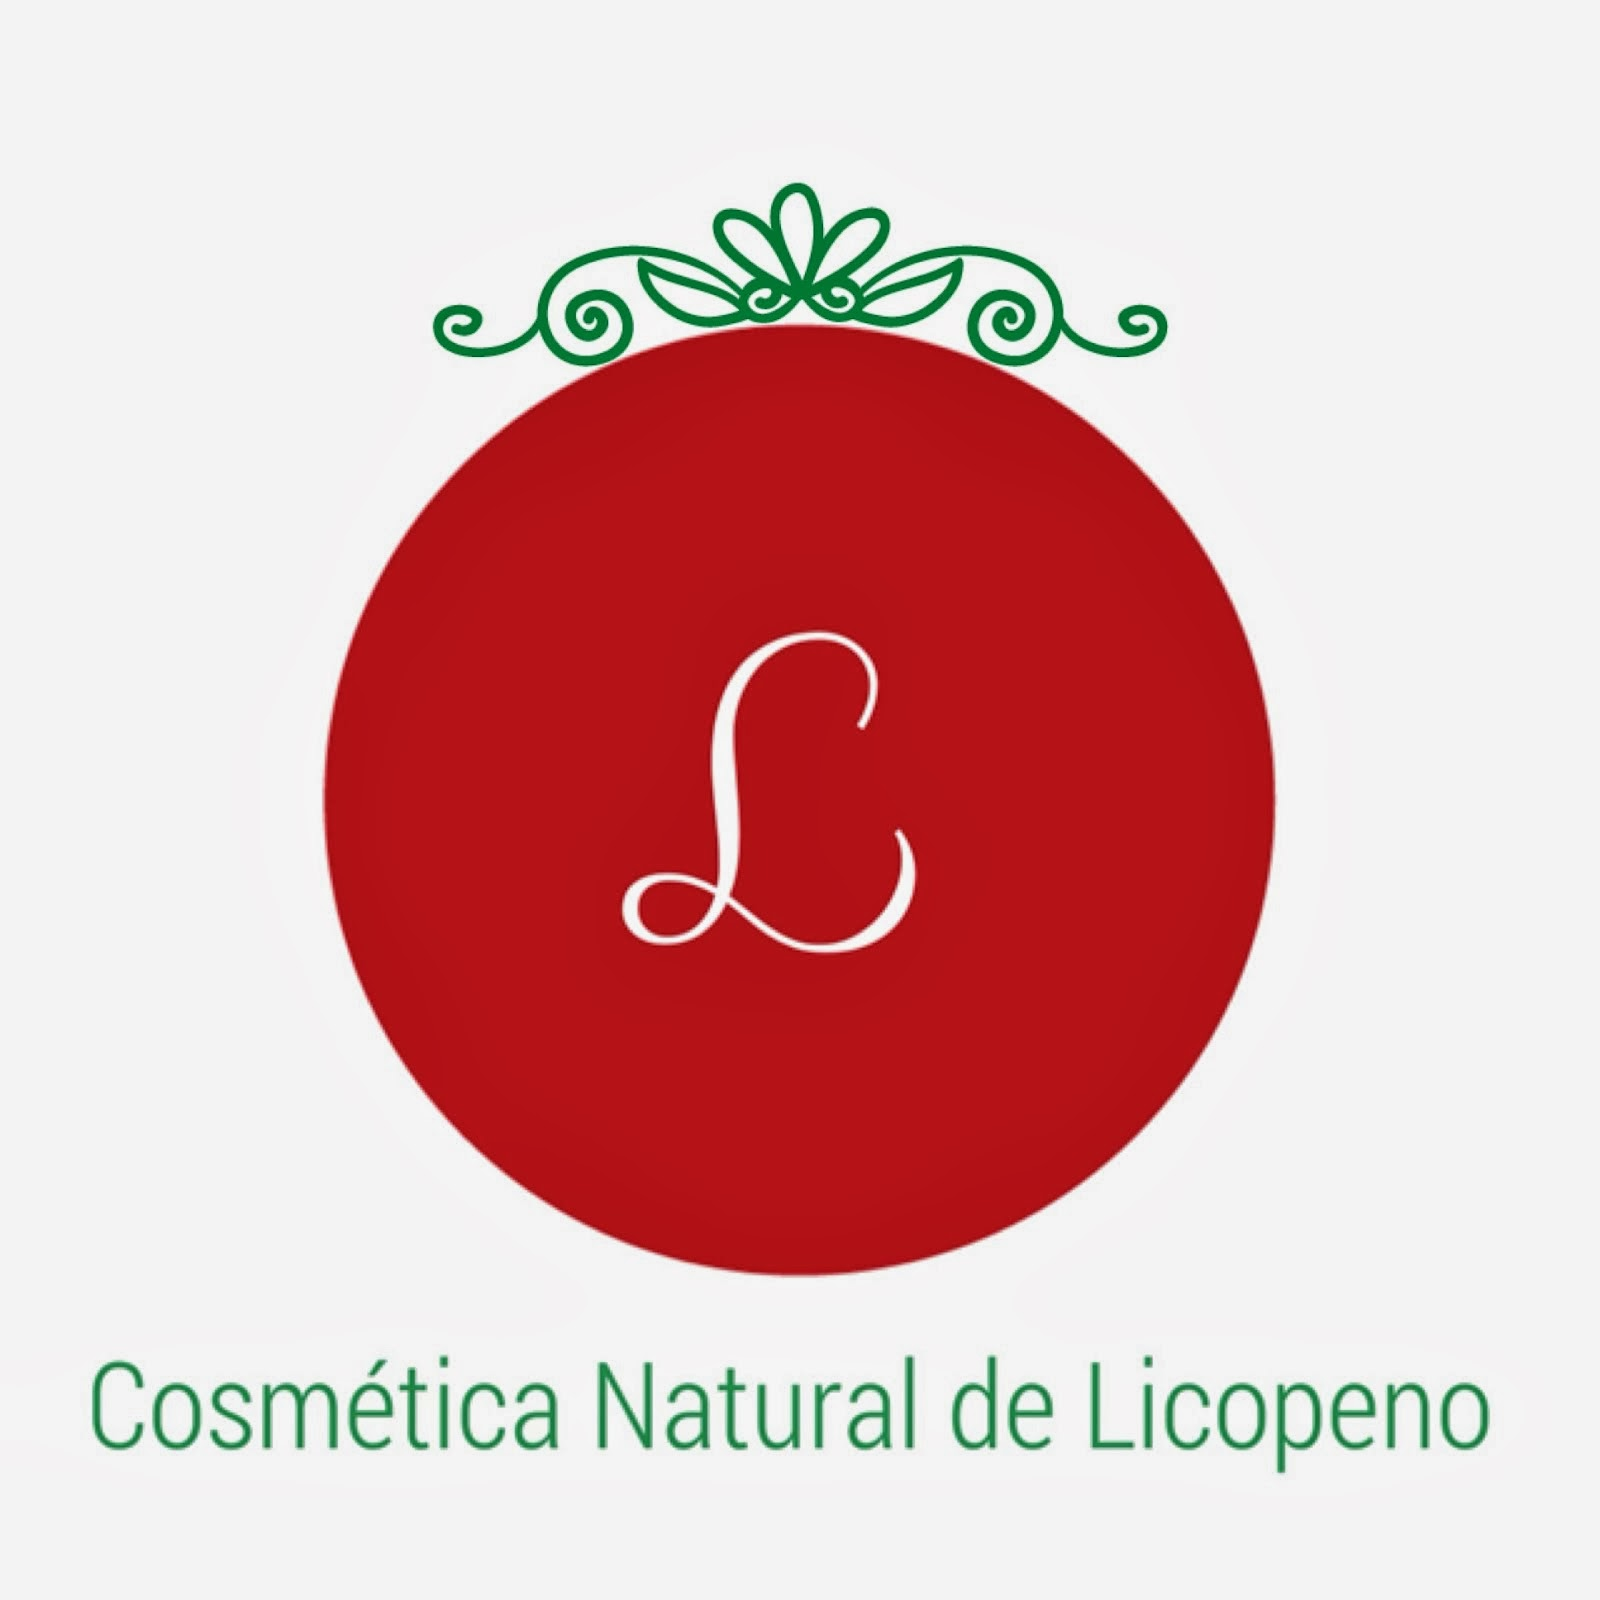 Cosmética Natural de Licopeno